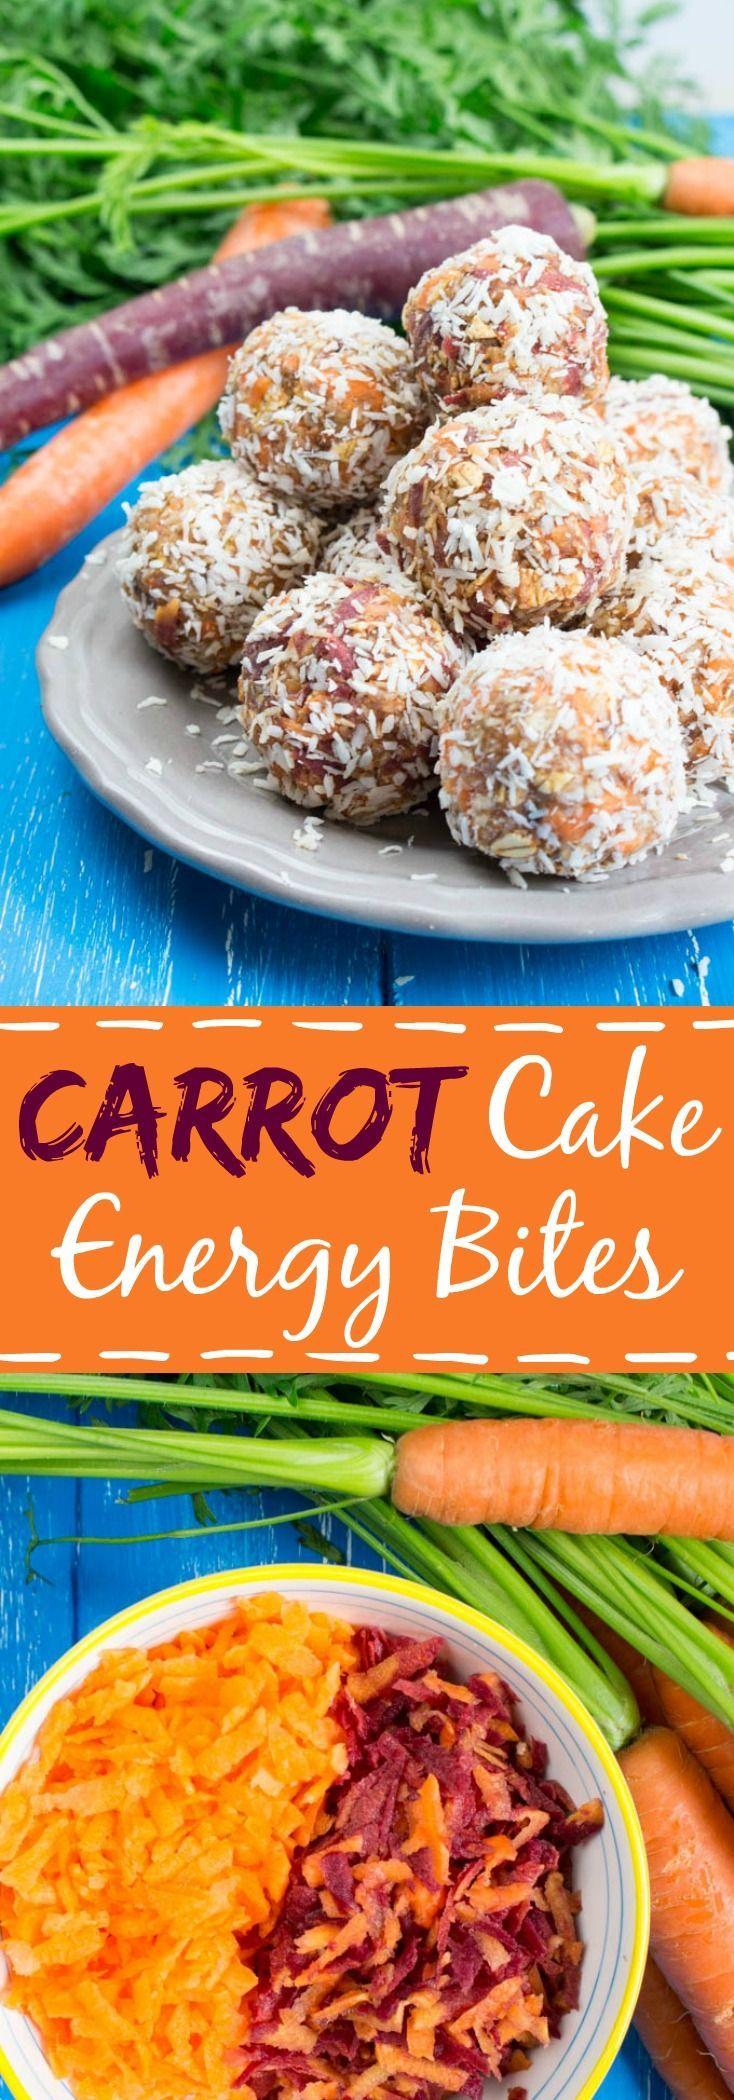 Carrot Cake Energy Balls (Holiday Bake)